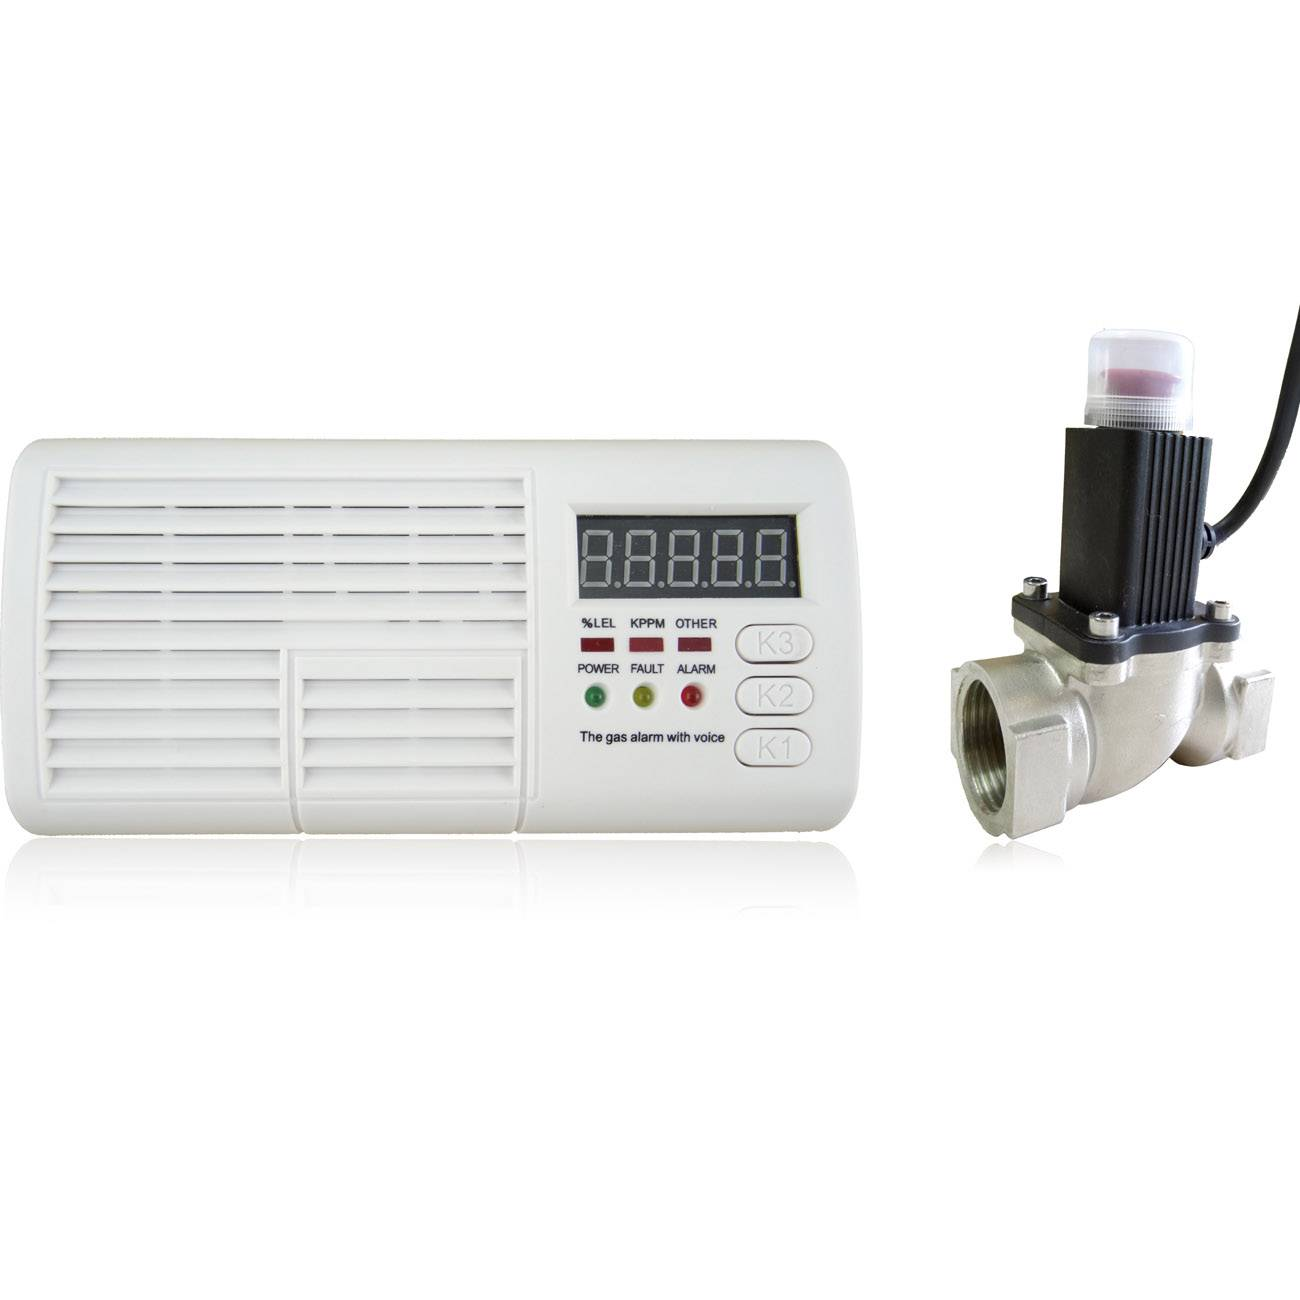 Smart Gas Detector with Digital Display & Solenoid Valve